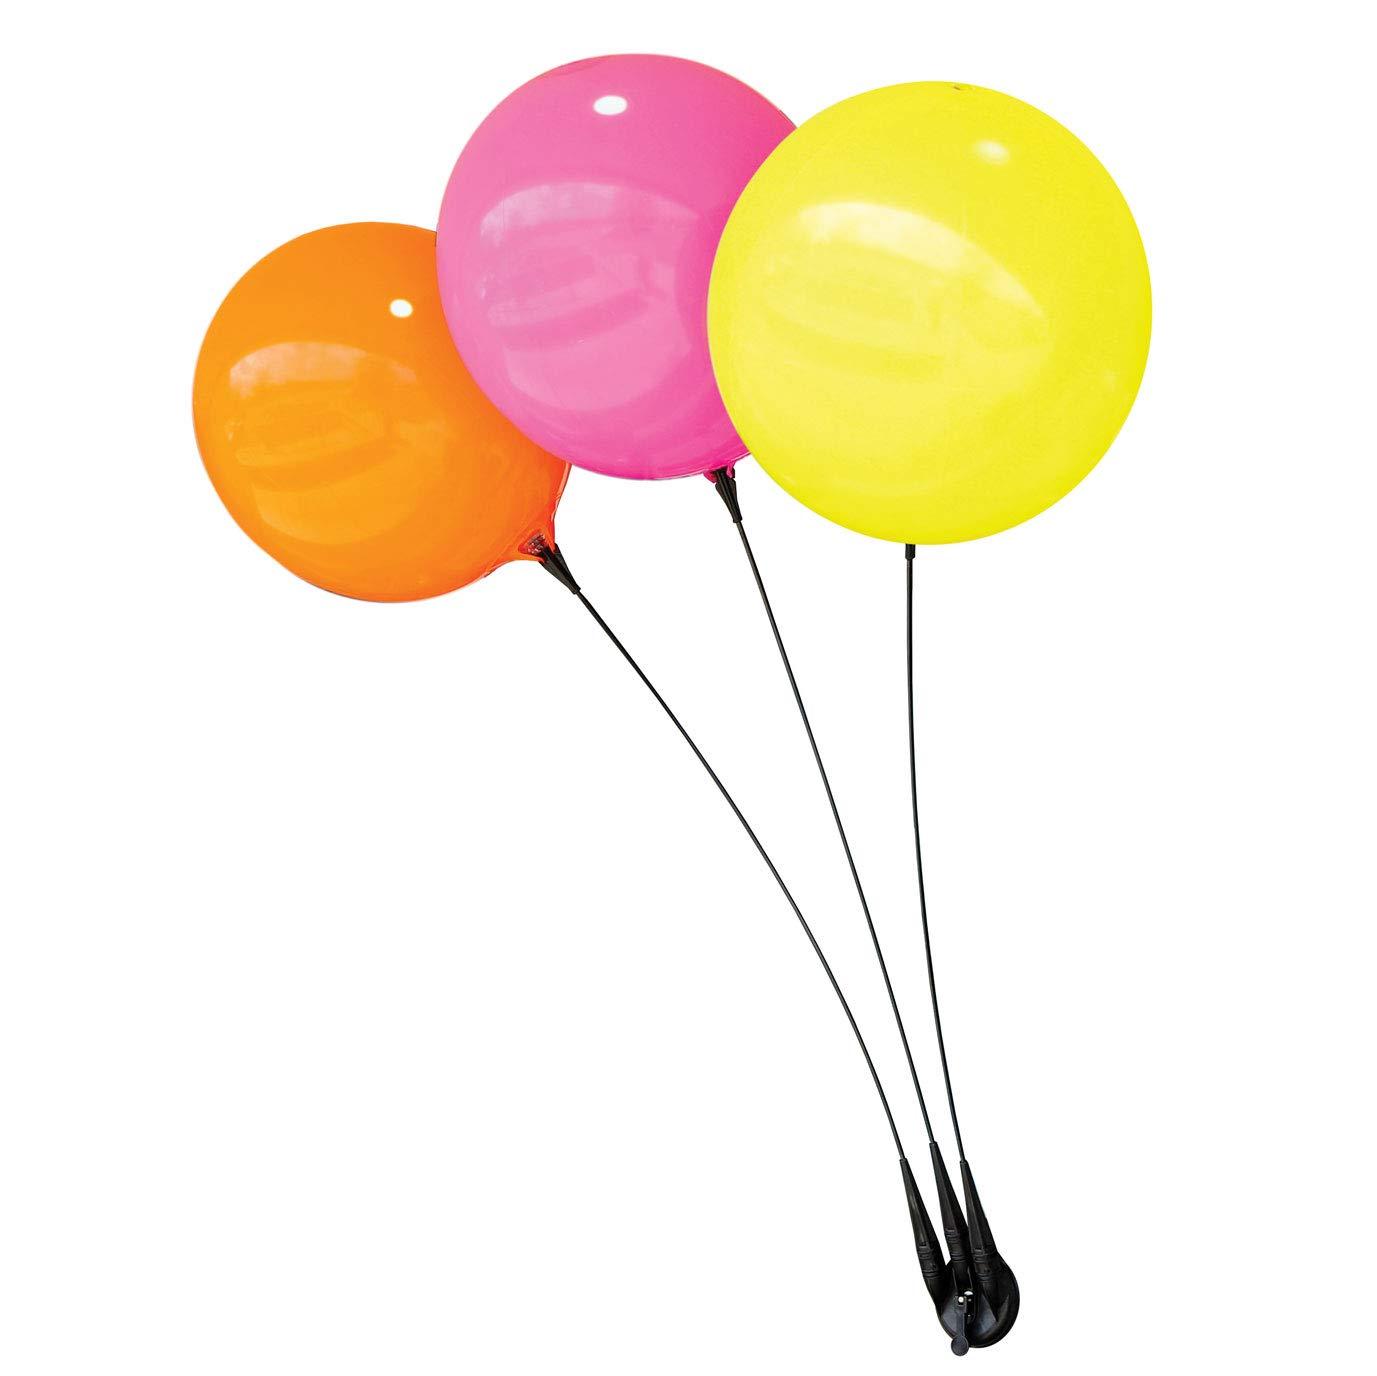 Balloon Bobber - Weatherproof Reusable Seamed Balloon Triple Suction Cup Kit - Helium Free Plastic Outdoor Balloons